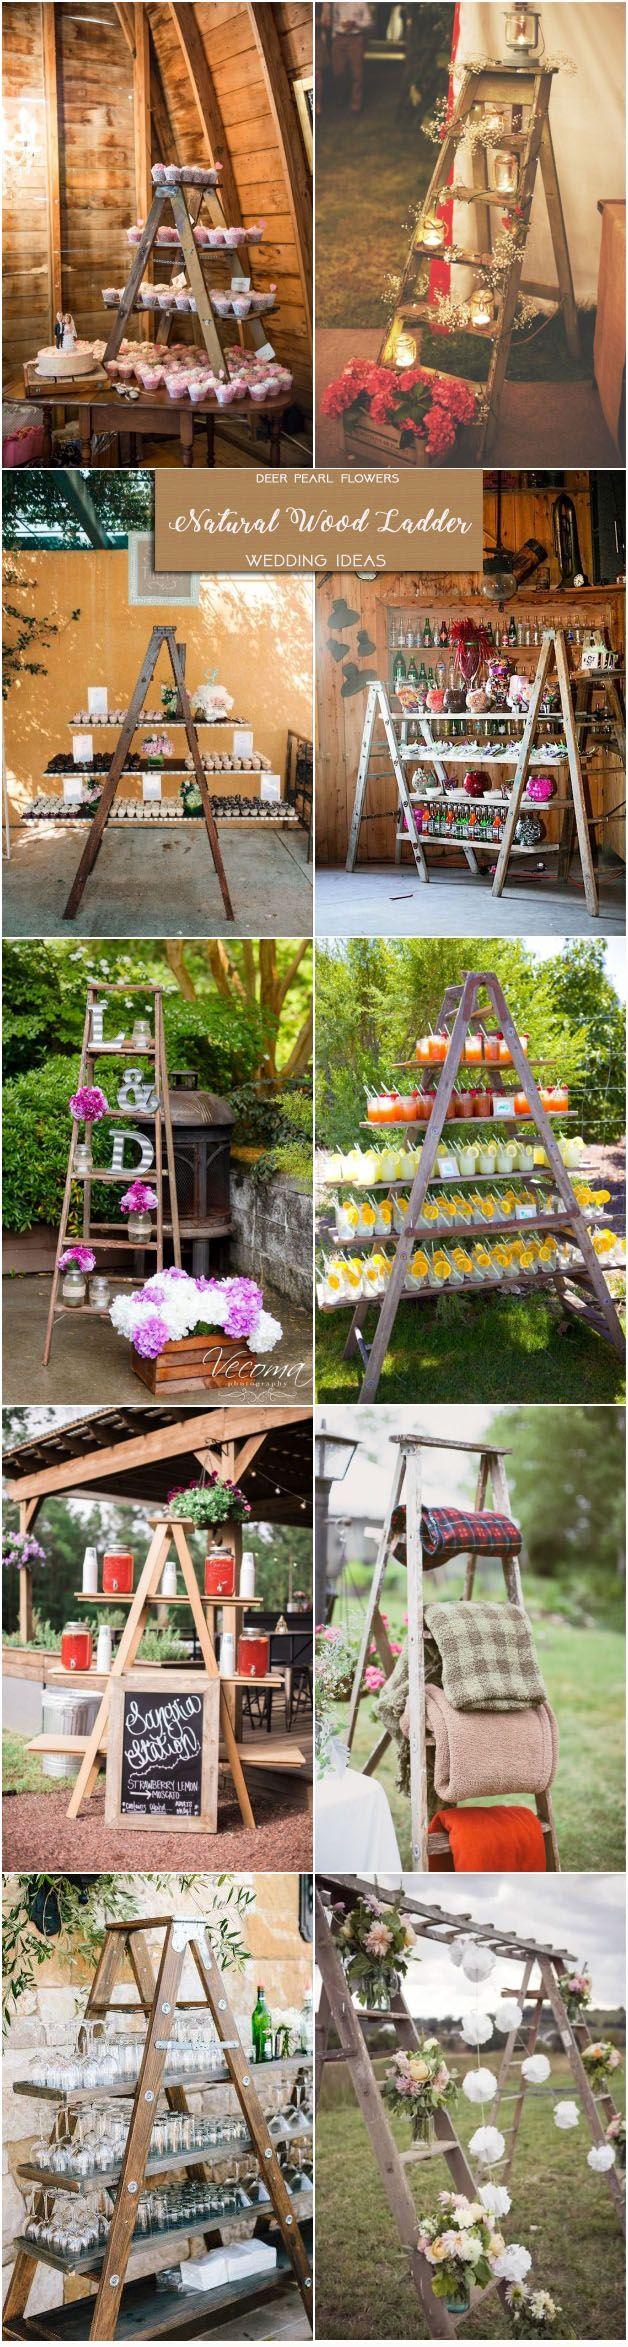 Top 14 rustic wedding themes ideas for 2018 part ii wood rustic wedding ideas natural wood ladder wedding decor ideas httpwww junglespirit Images